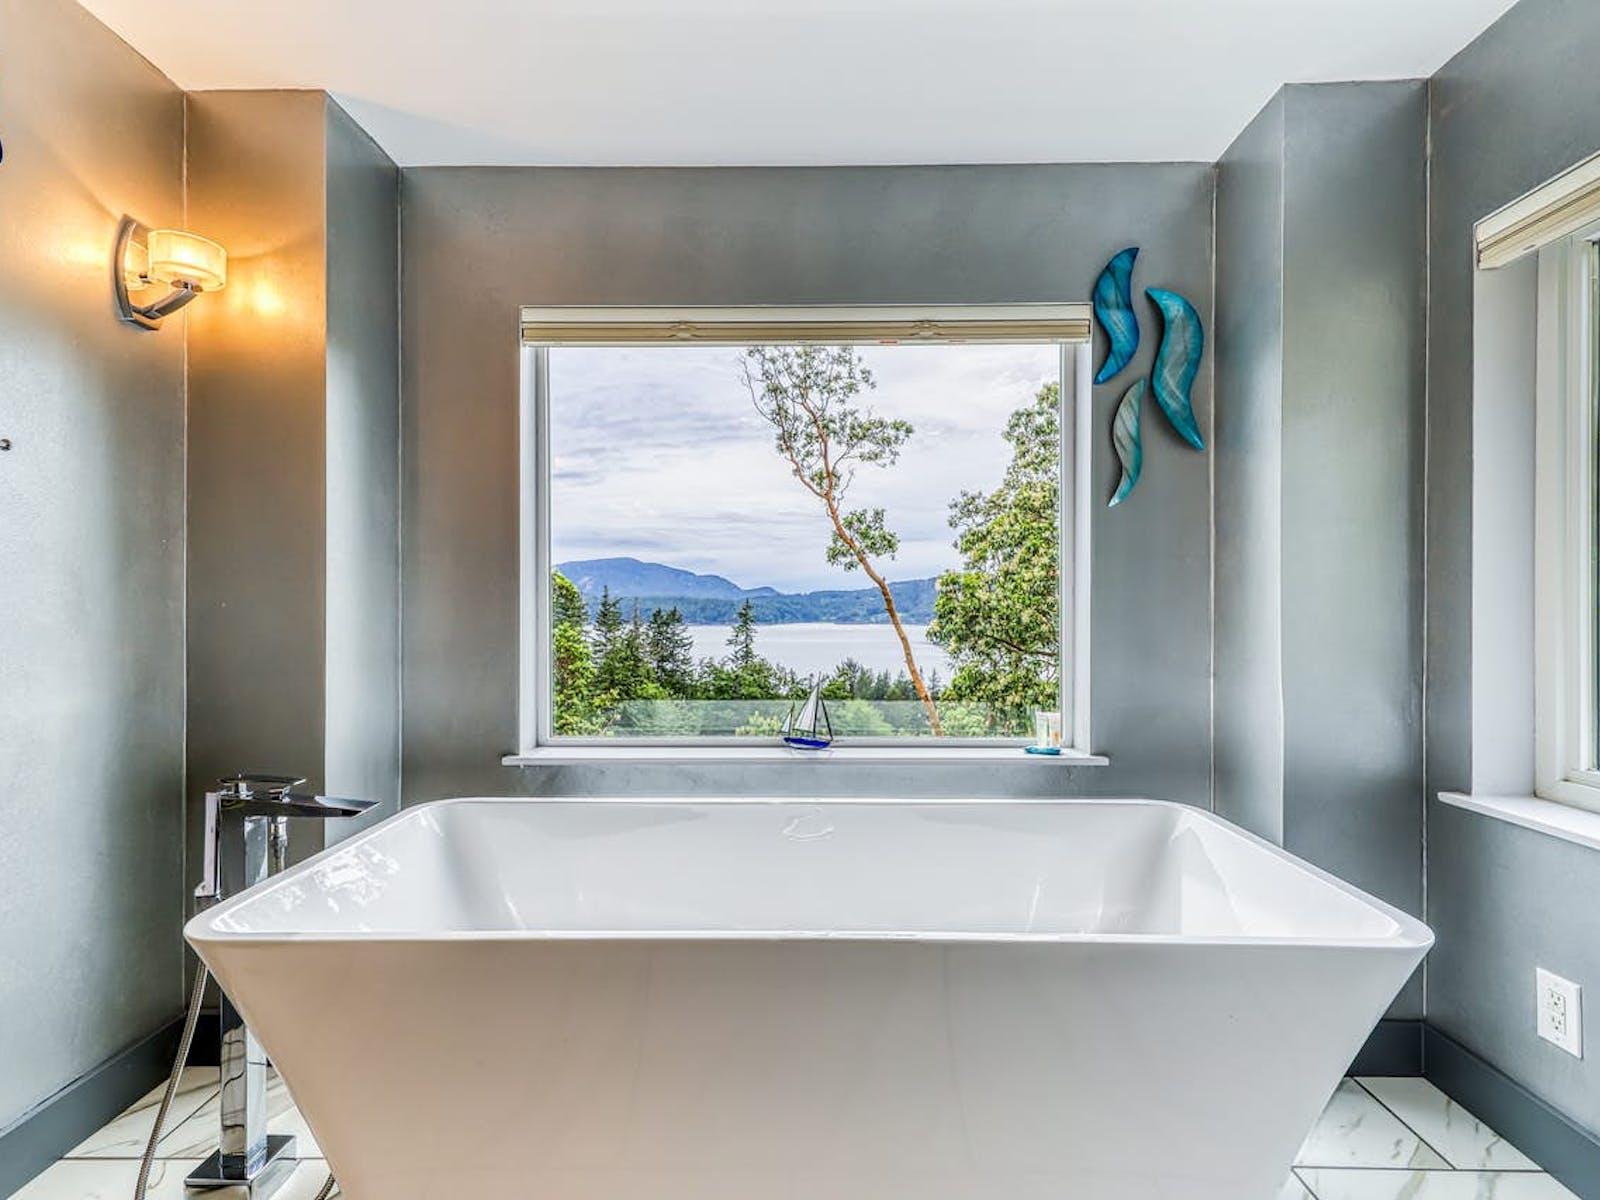 angular bathtub offers stunning views of the Puget Sound